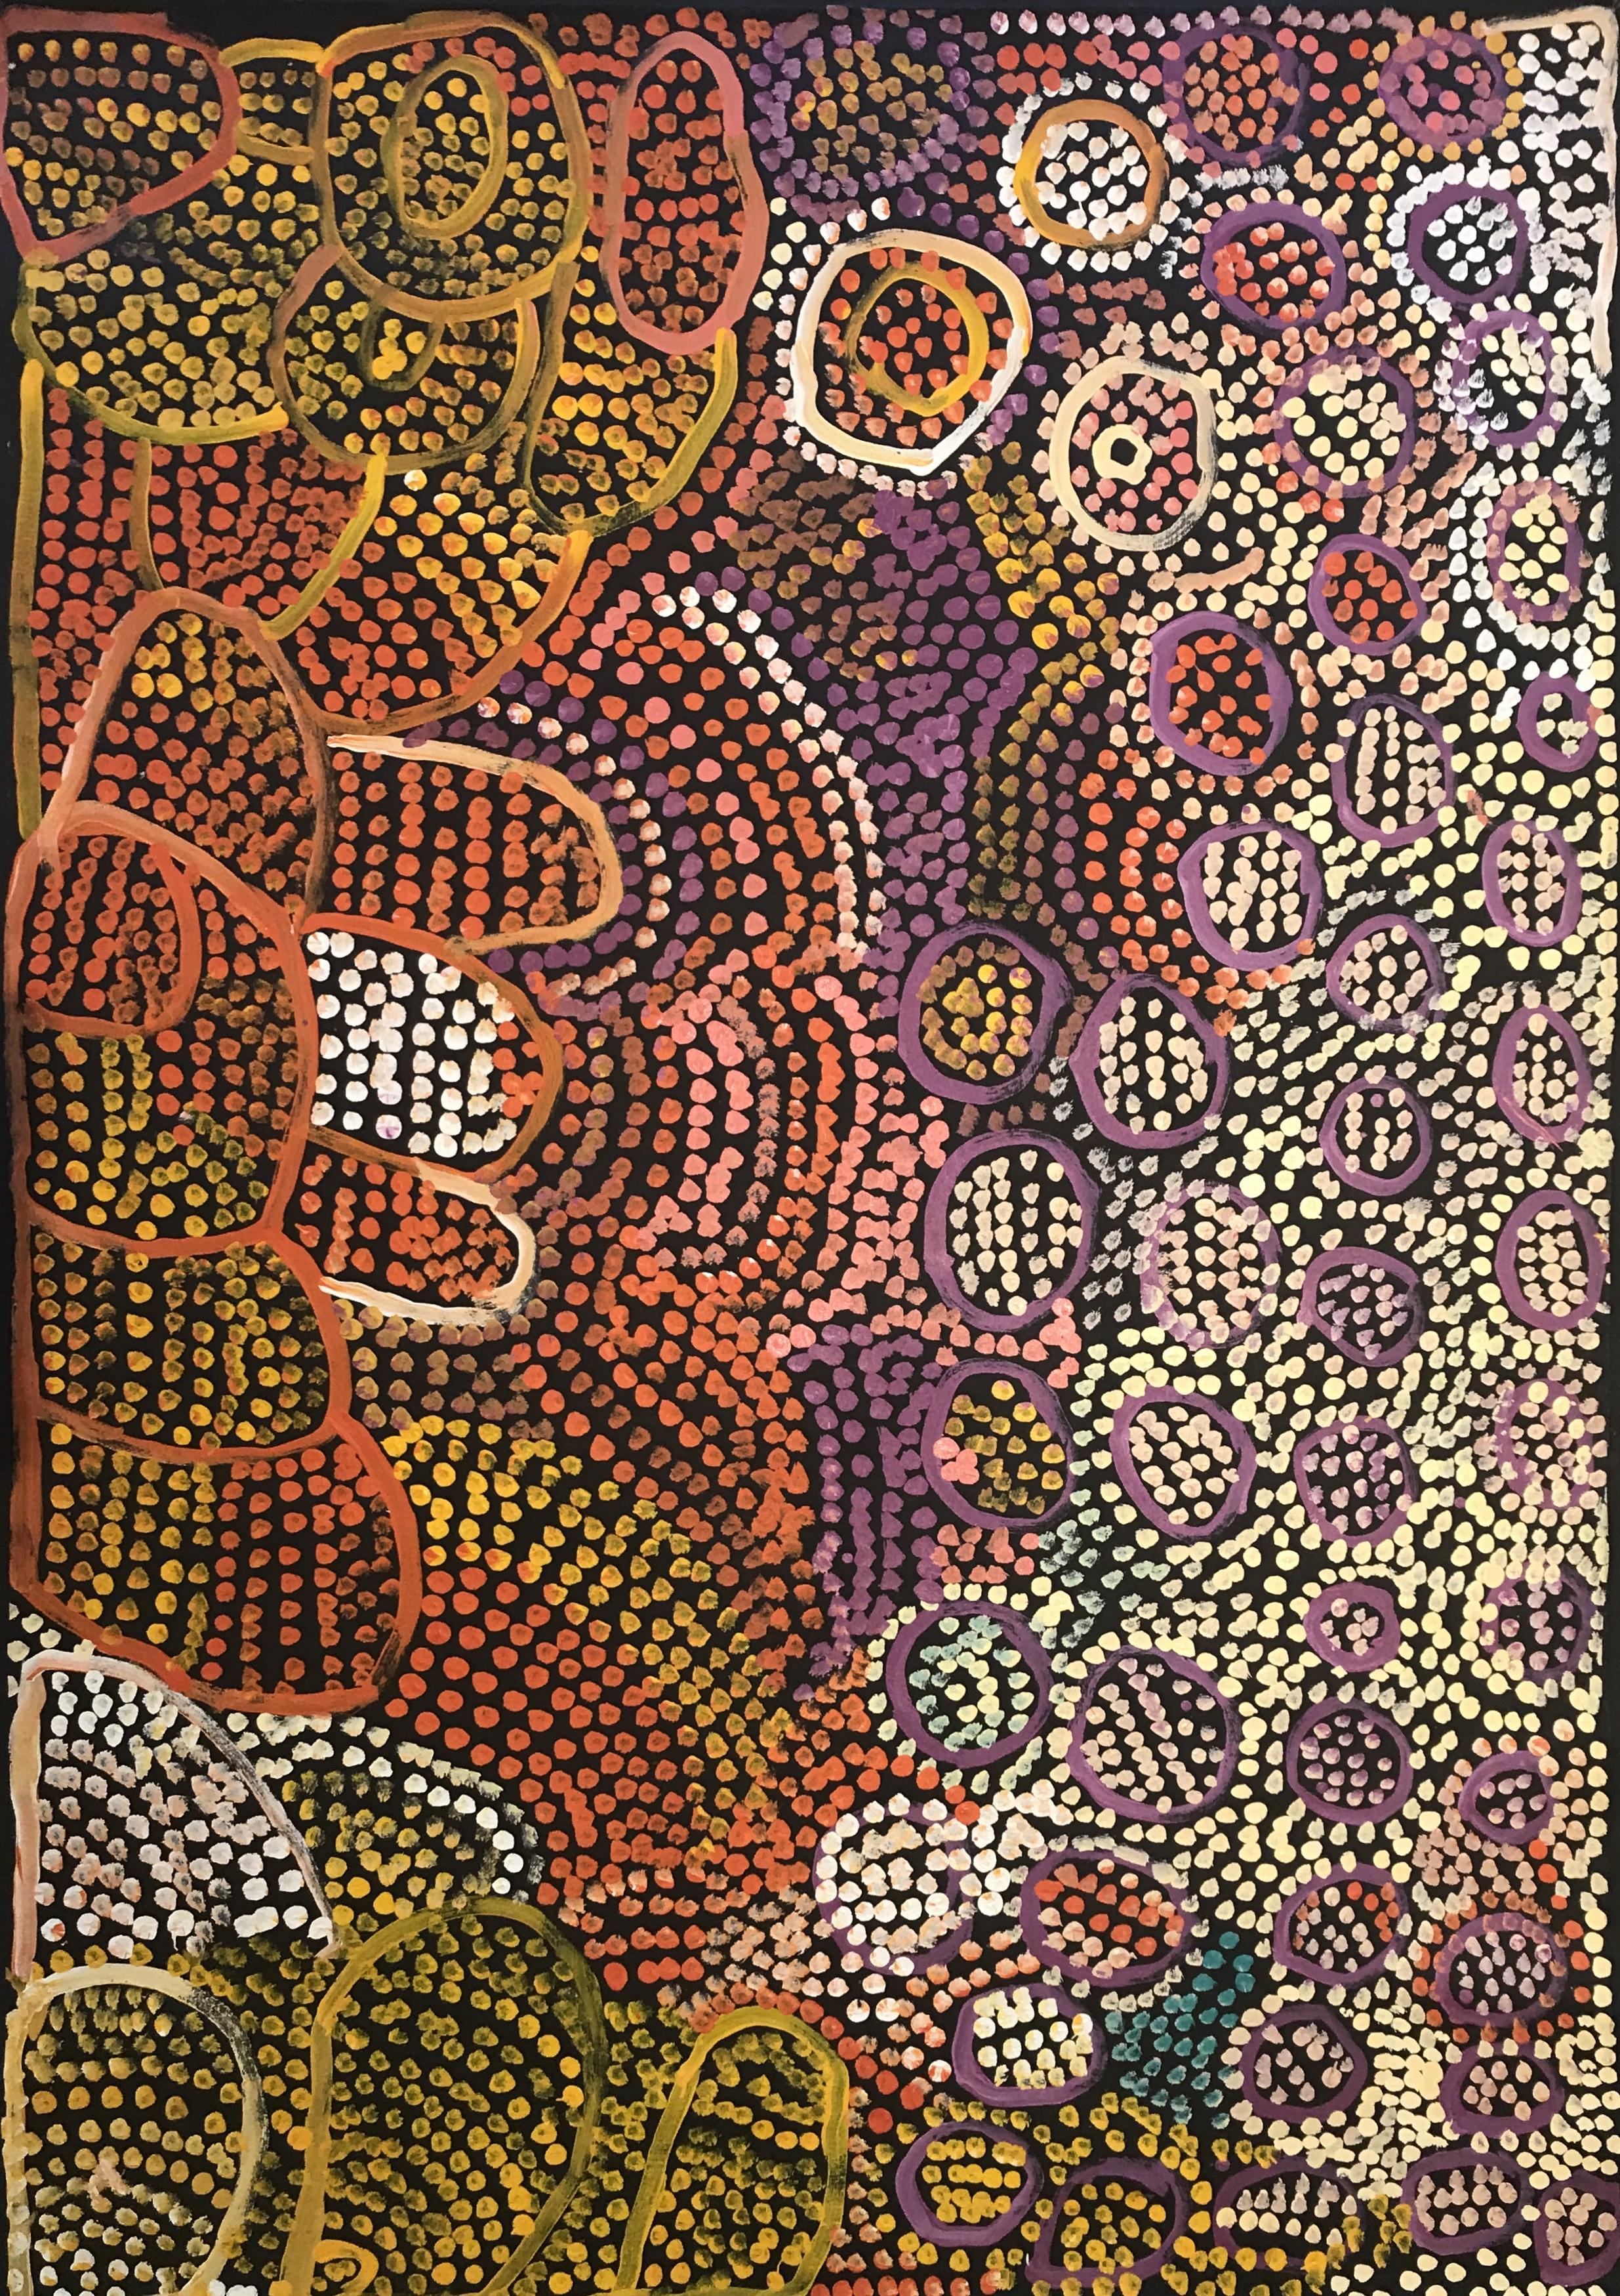 Milatjari Pumani  Ngura Walytja, Antara  59 x 42 inches (152 x 106cm)  acrylic on linen Mimili Maku Arts Catalog #358-12   EMAIL INQUIRY